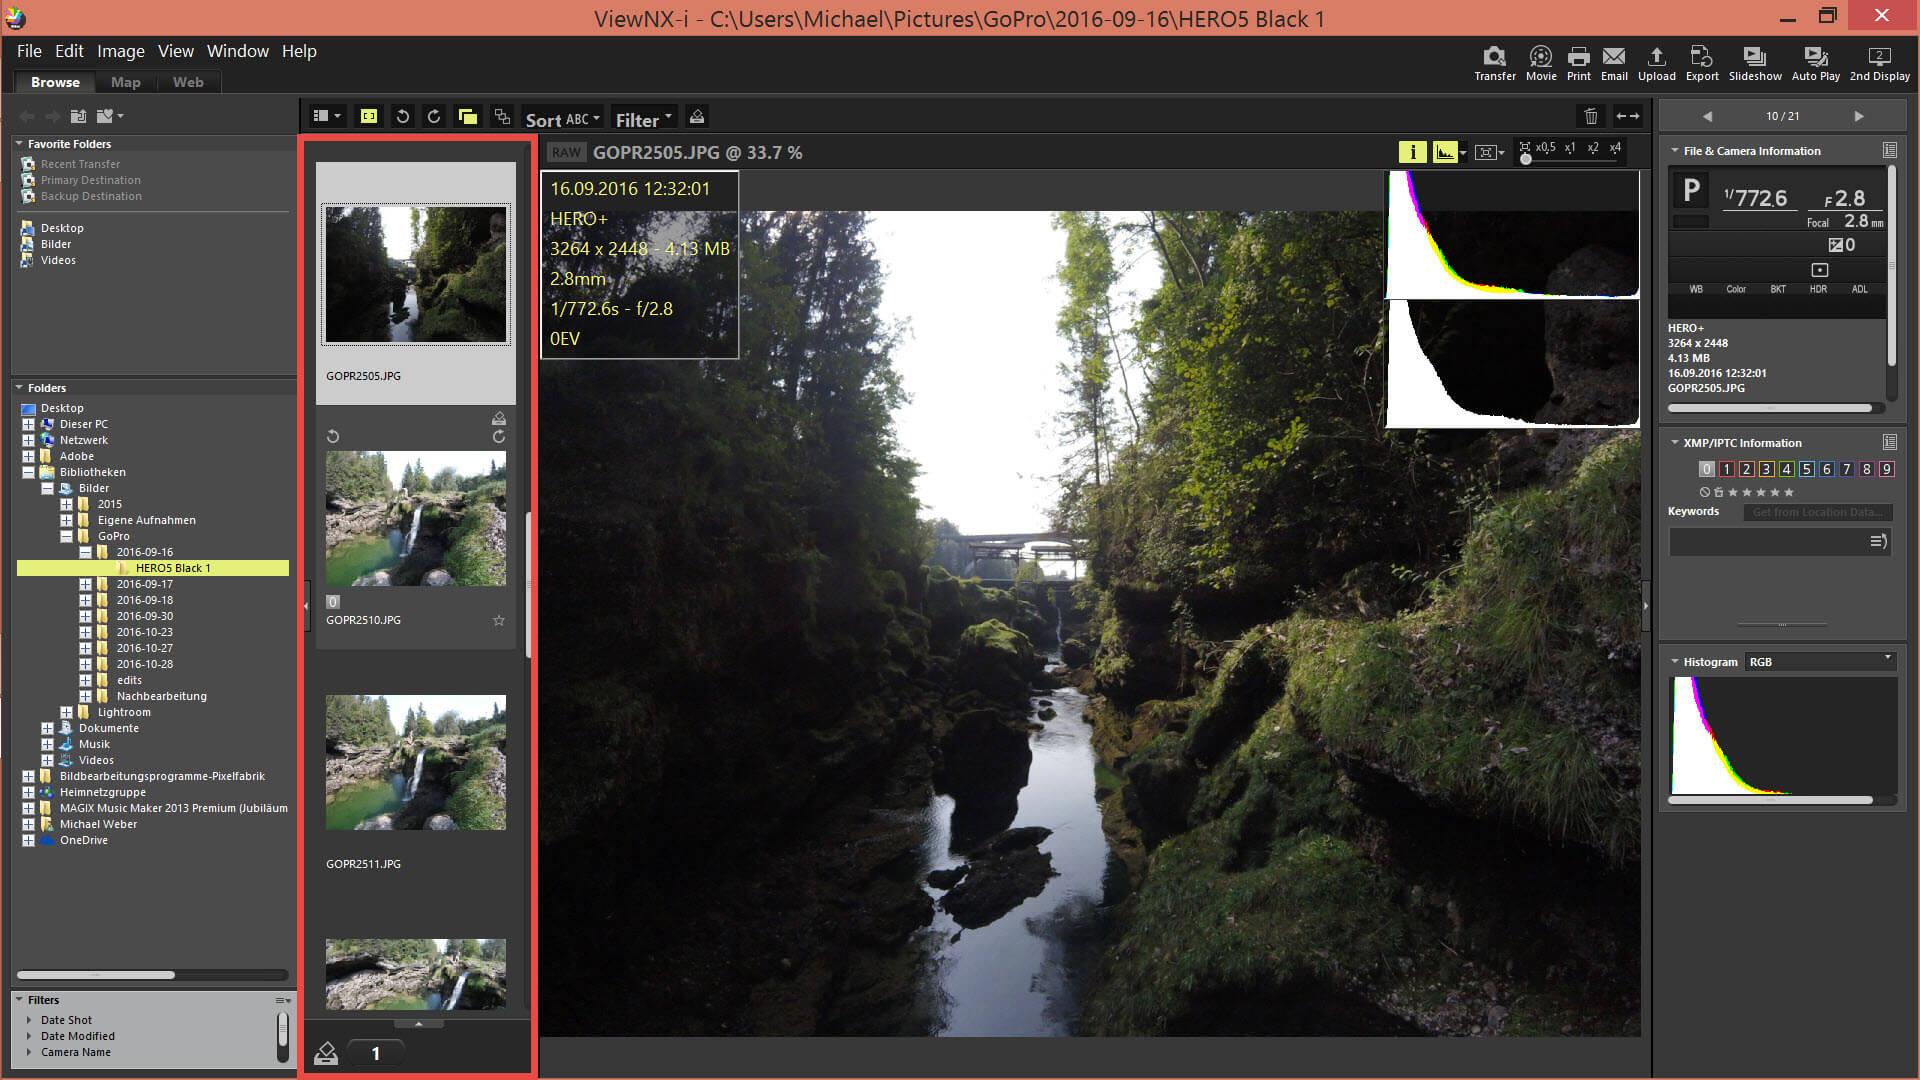 Nikon View NX-i